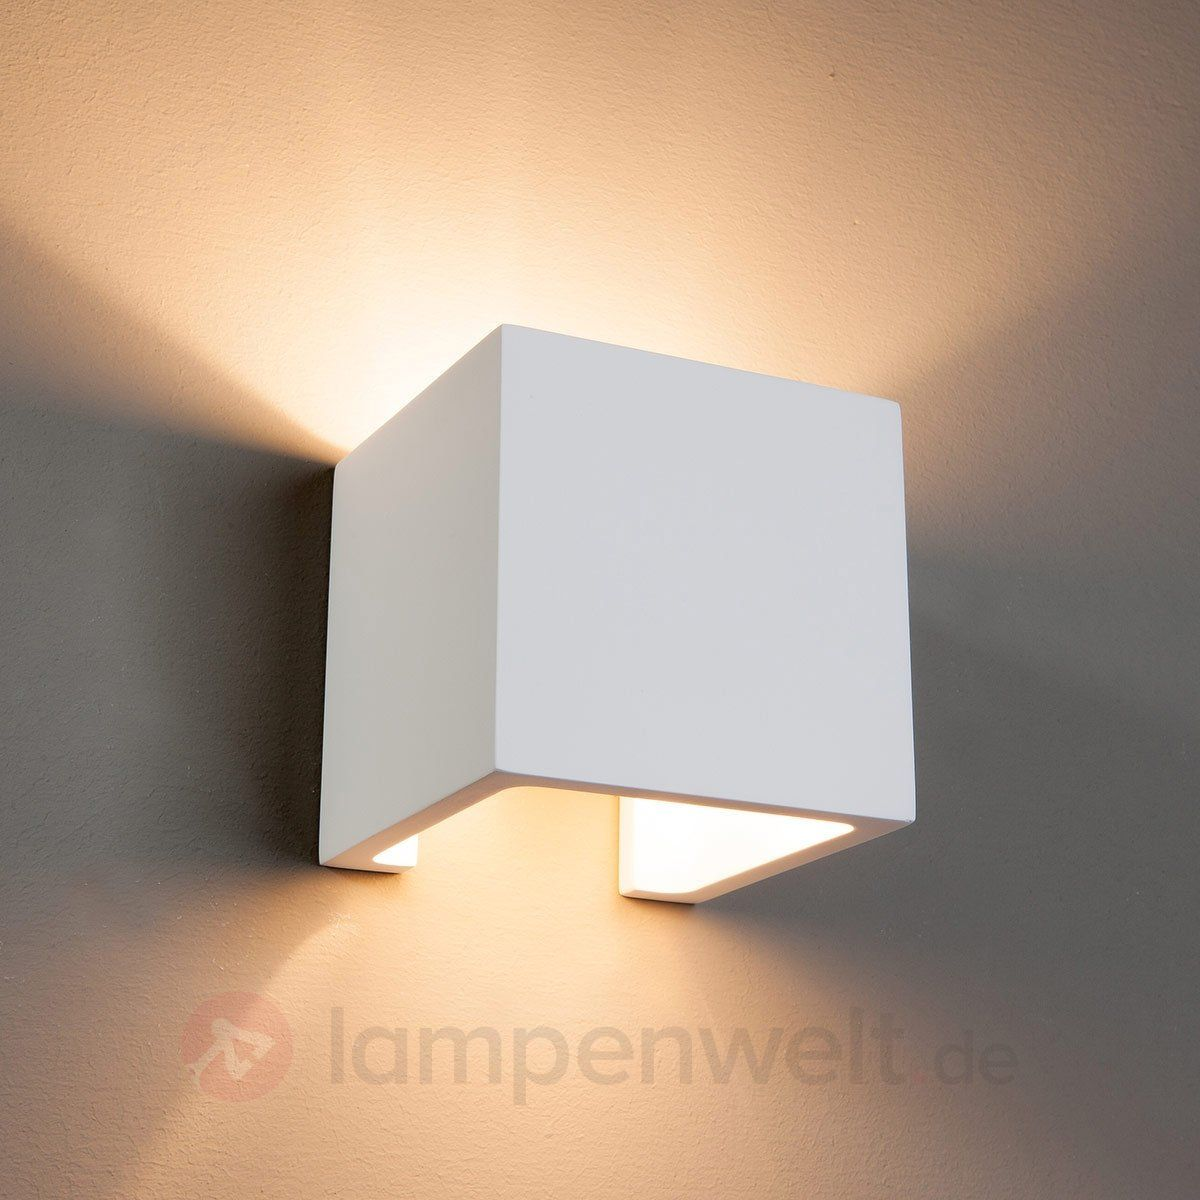 Dezente Halogen Wandleuchte Freja Aus Gips 9613001 Wandleuchte Fassadenbeleuchtung Lampen Und Leuchten